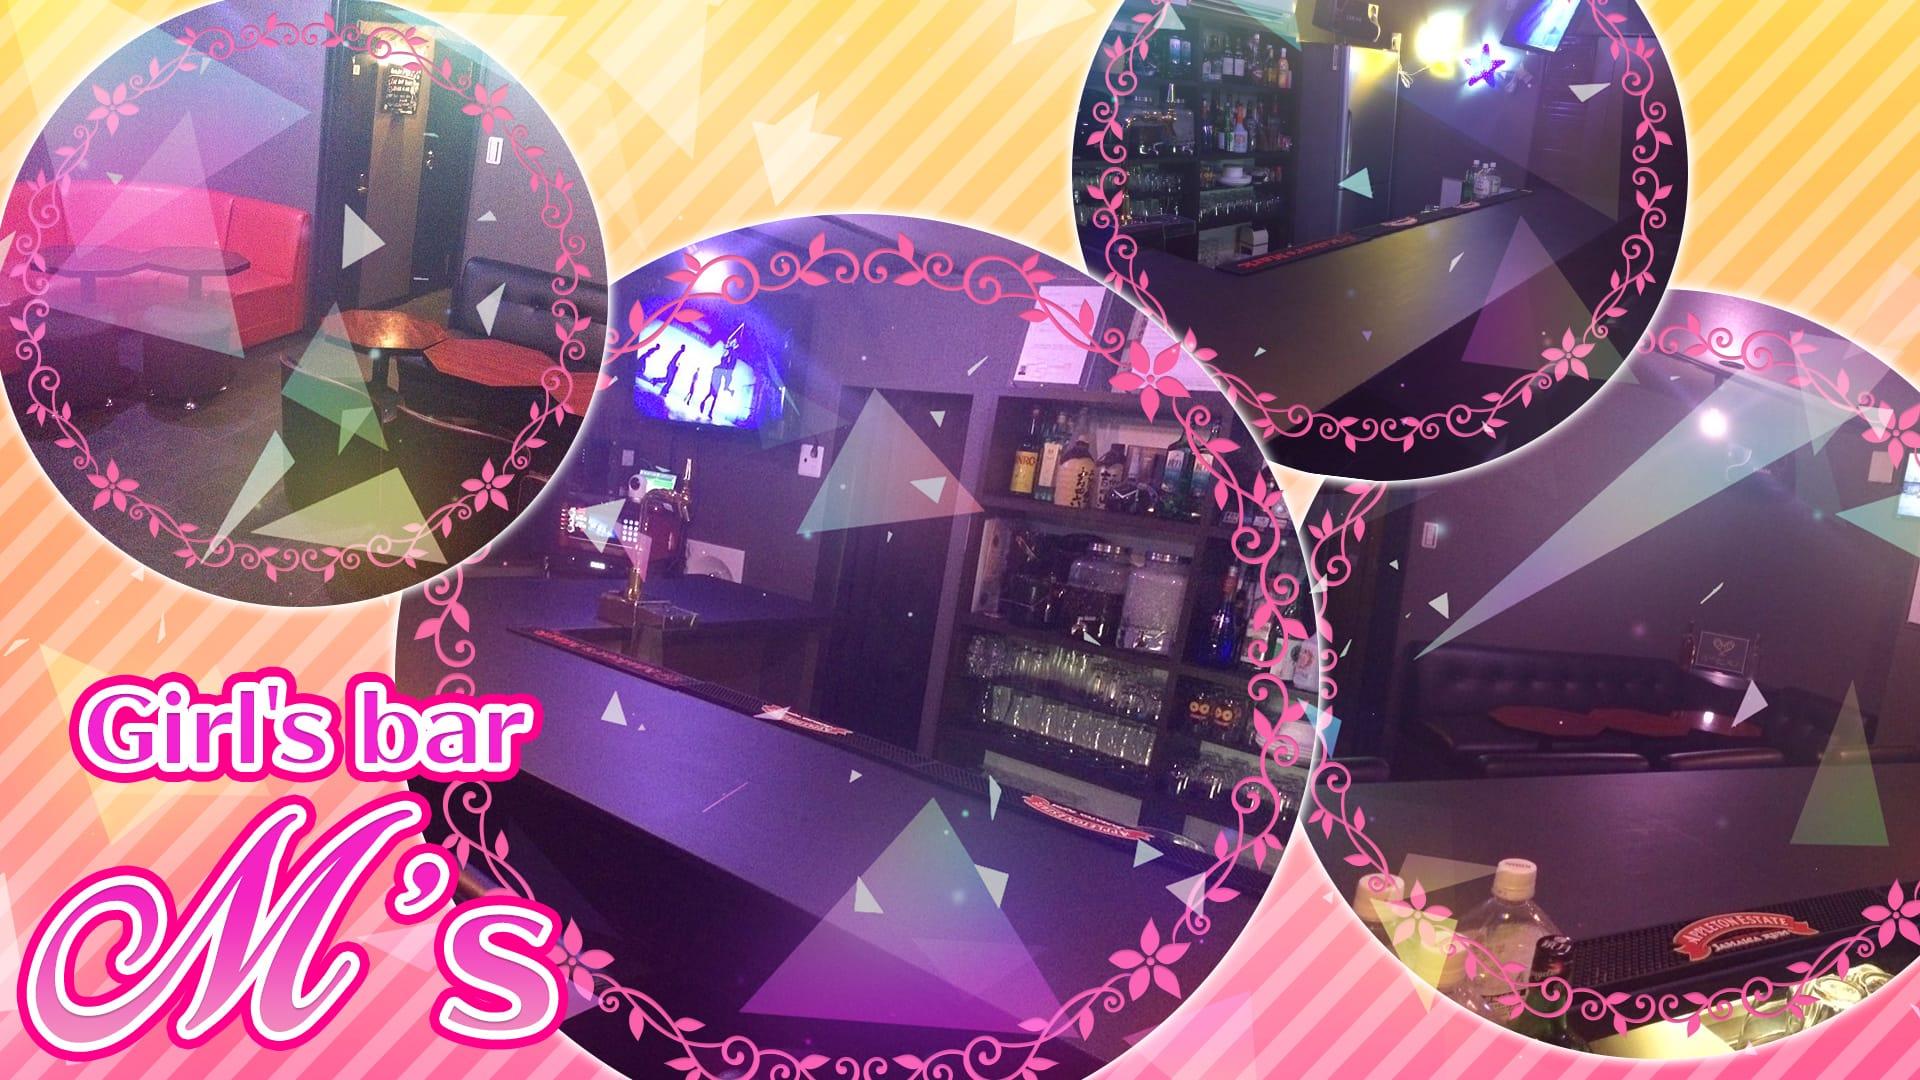 Girl's bar M's (エムズ) 大宮ガールズバー TOP画像